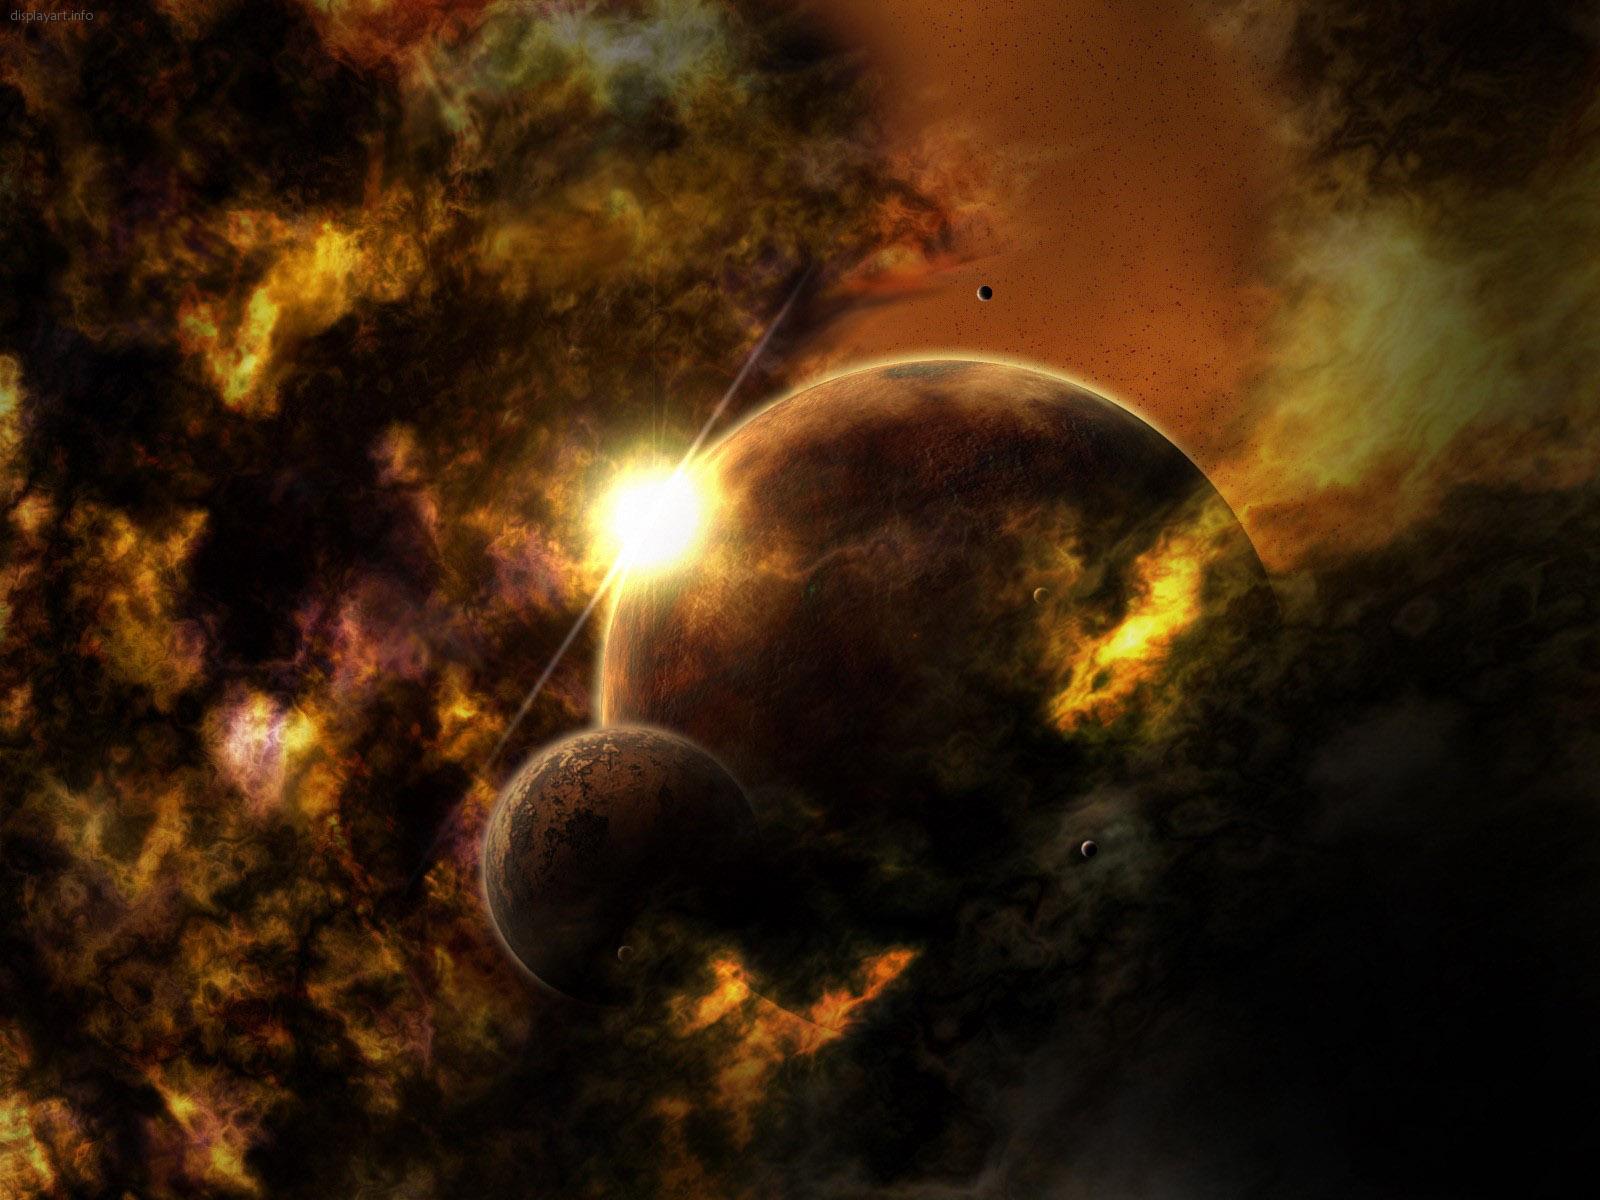 http://3.bp.blogspot.com/-Kp8NAKAPkvo/TzPUsa3E1bI/AAAAAAAAAOg/HJsZLQtAJ6U/s1600/Fantasy-Space-wallpaper.jpg